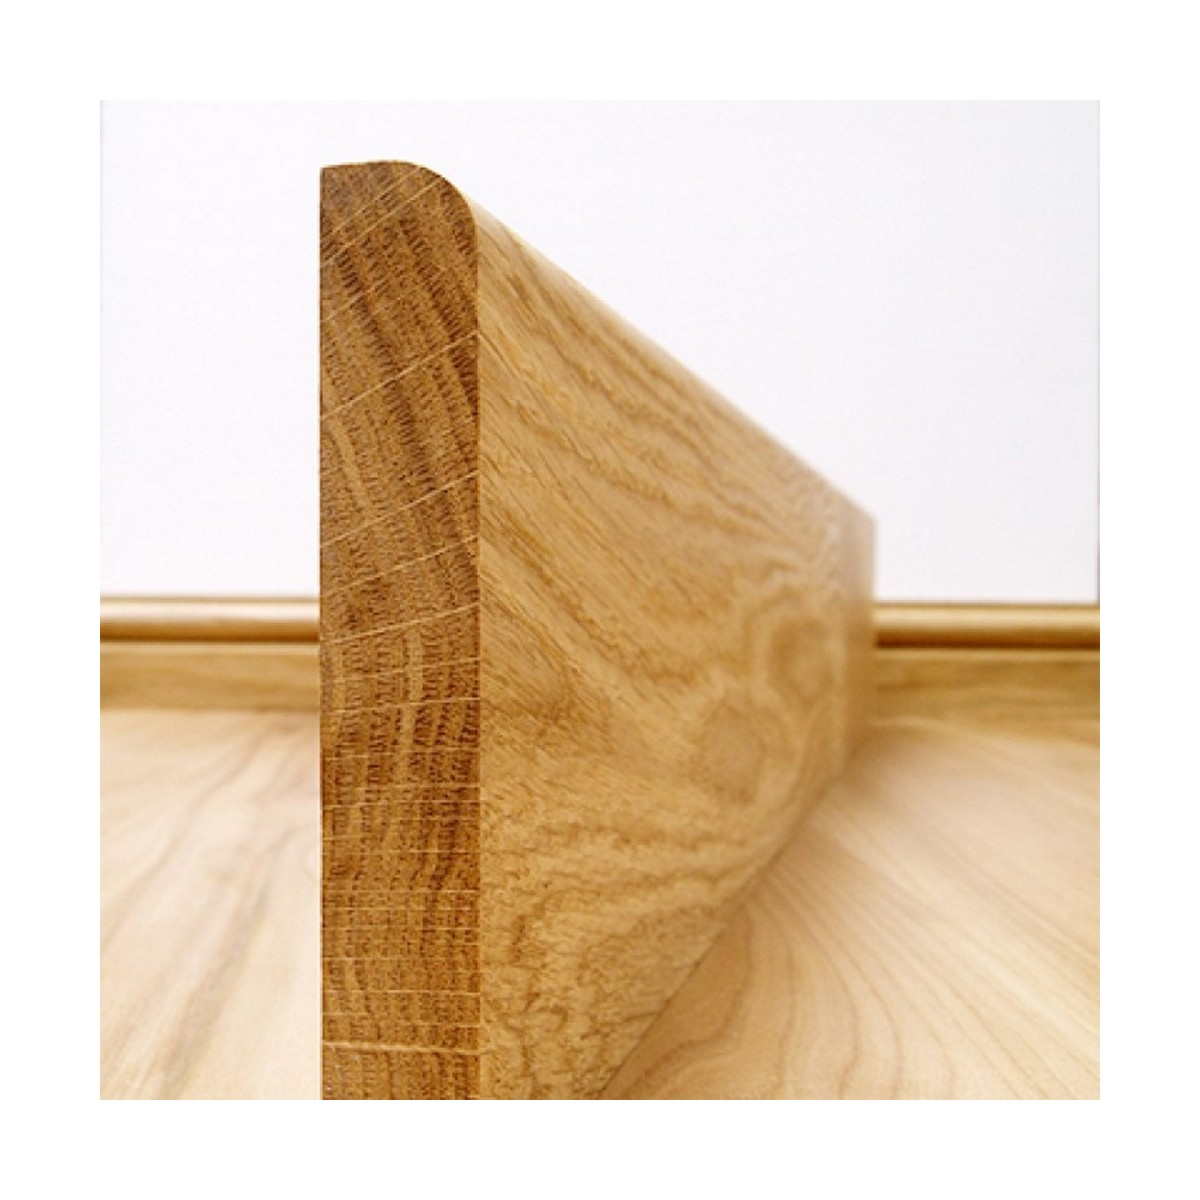 Plinthe Chêne Massif 20x120 Bord Arrondi  - Qualité Rustique